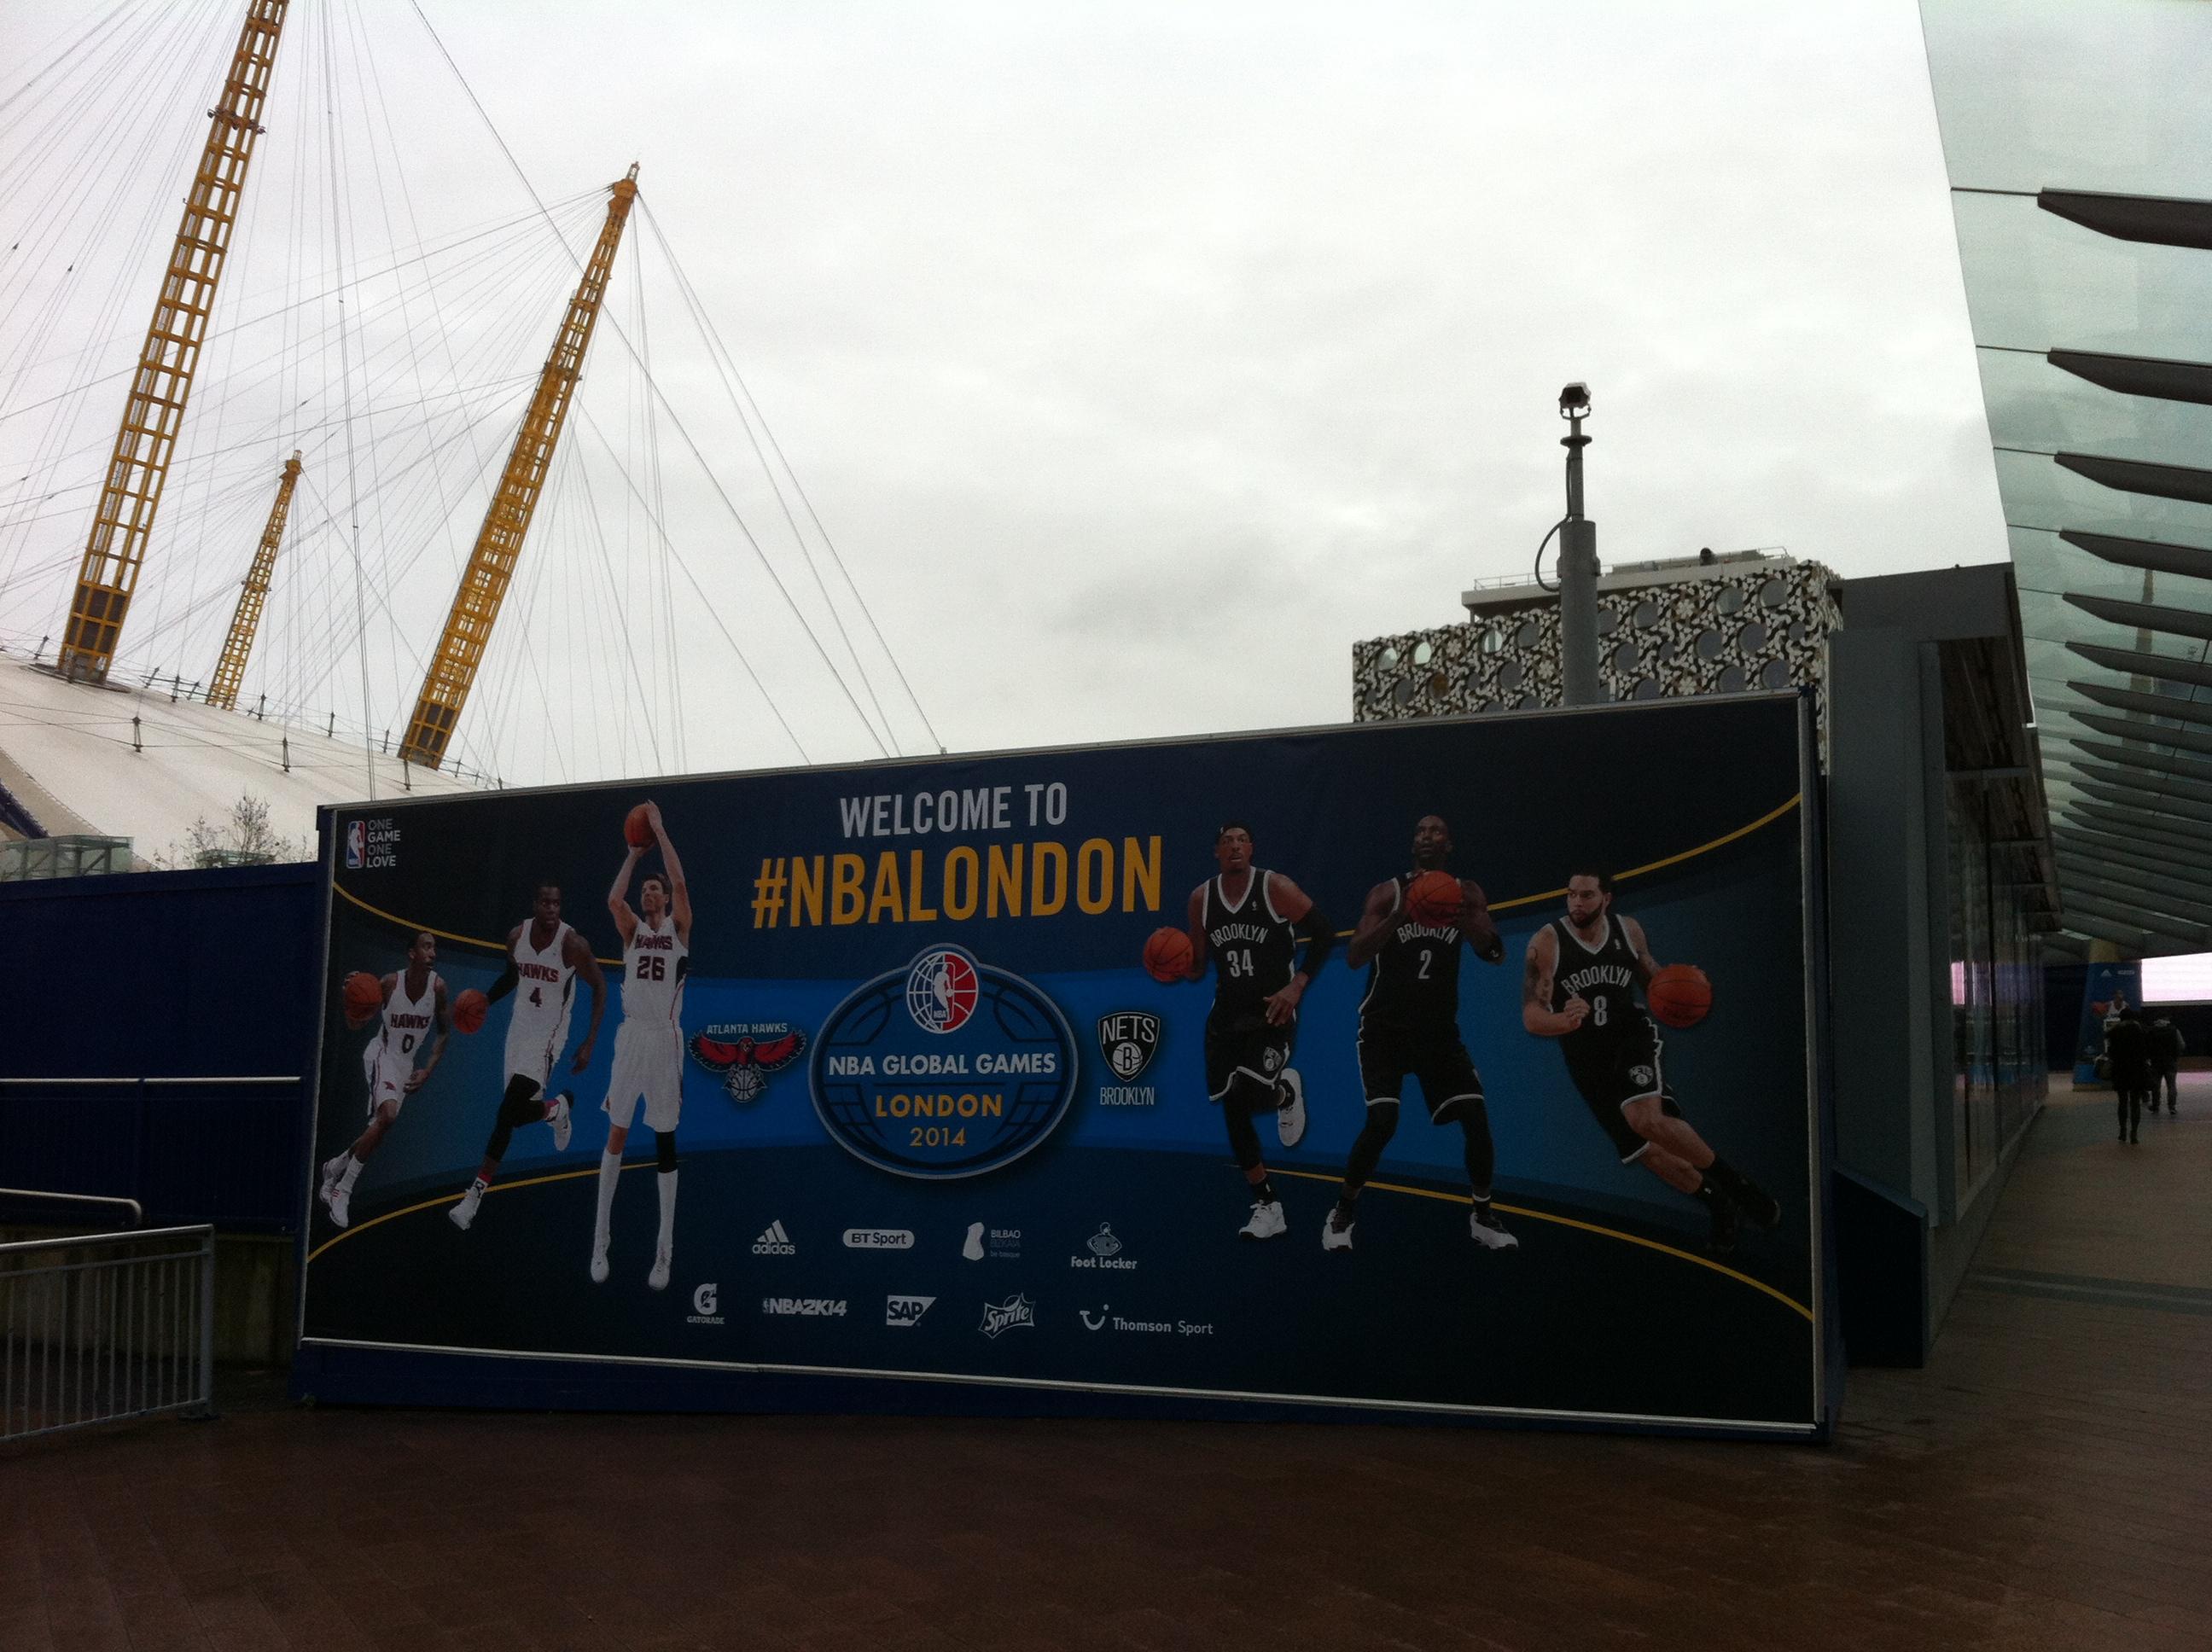 Viviendo la Gira NBA Londres 2014 desde dentro  